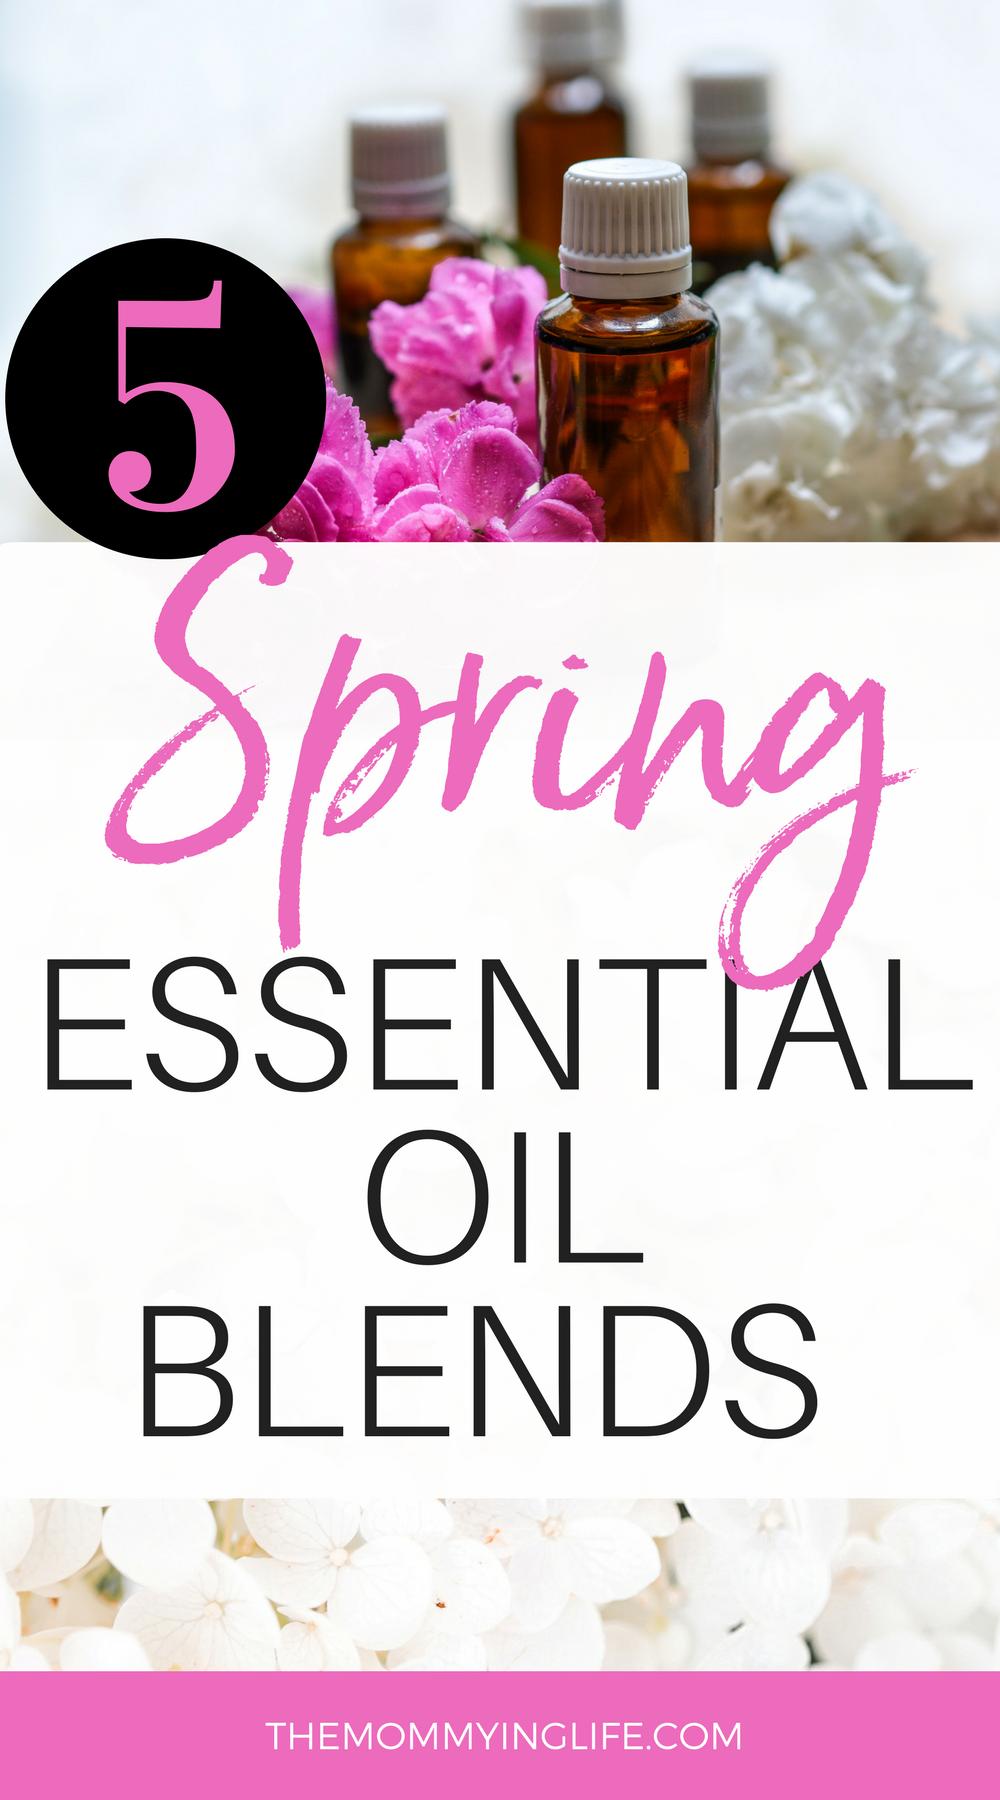 Essential Oil Blends for Spring.png